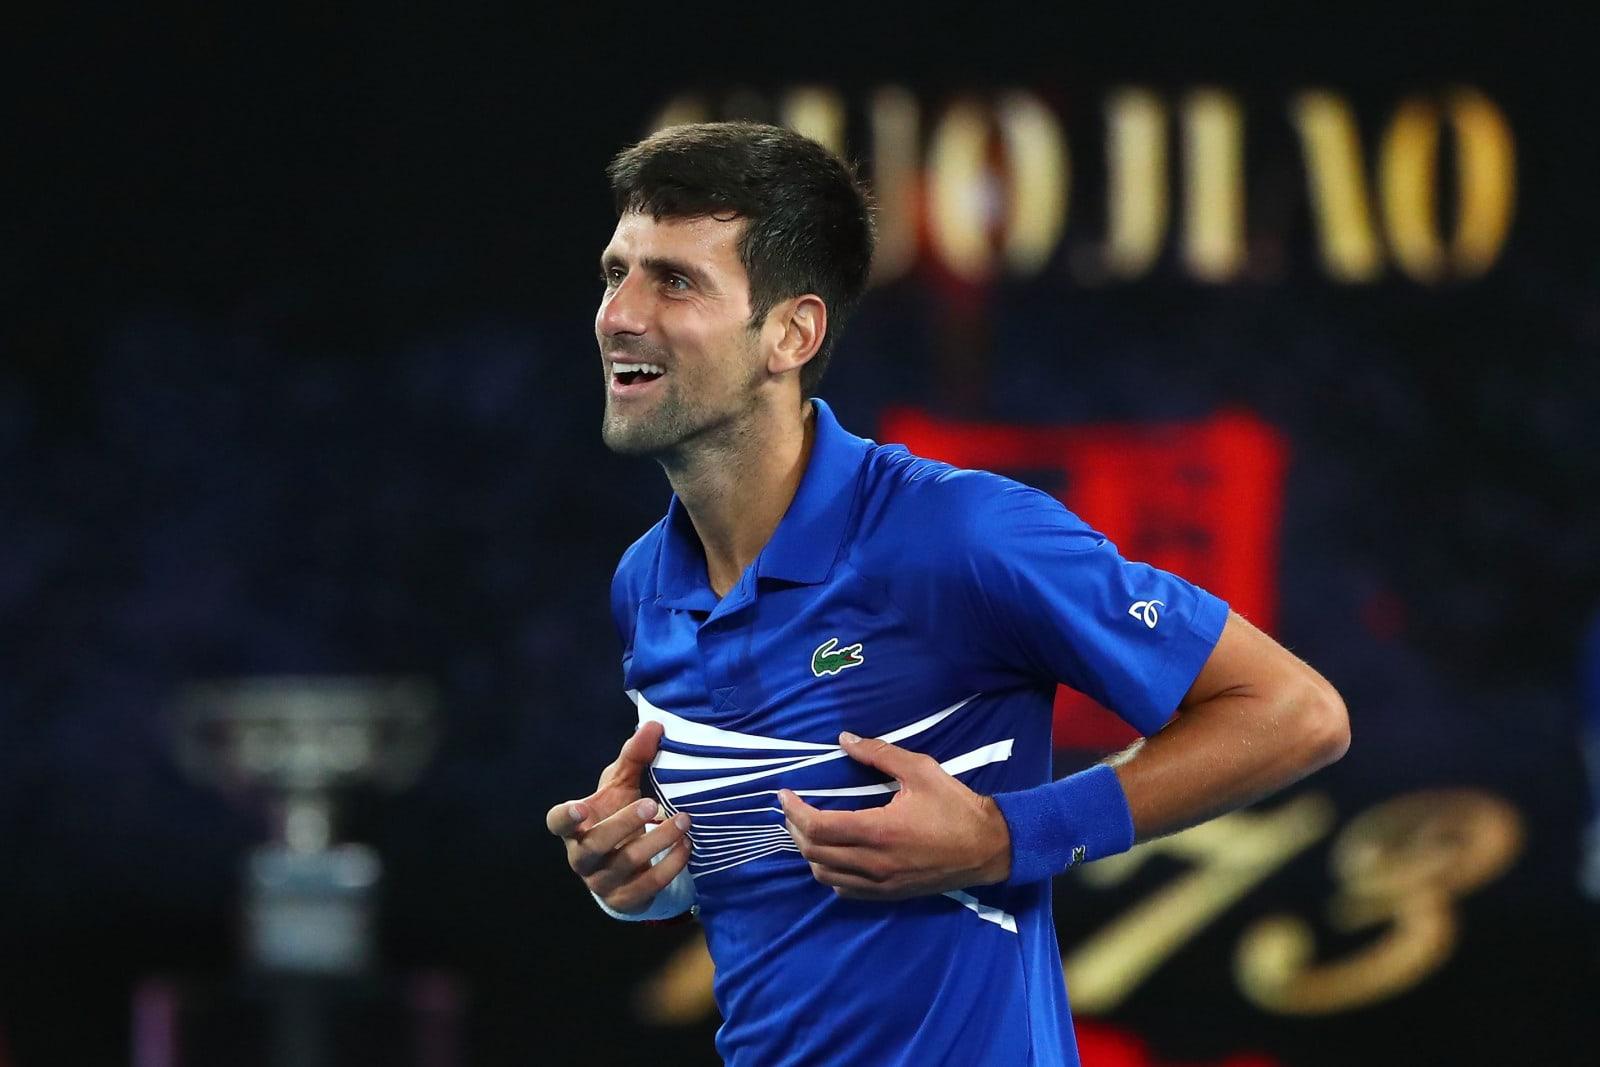 Novak Djokovic wins the Australian Open